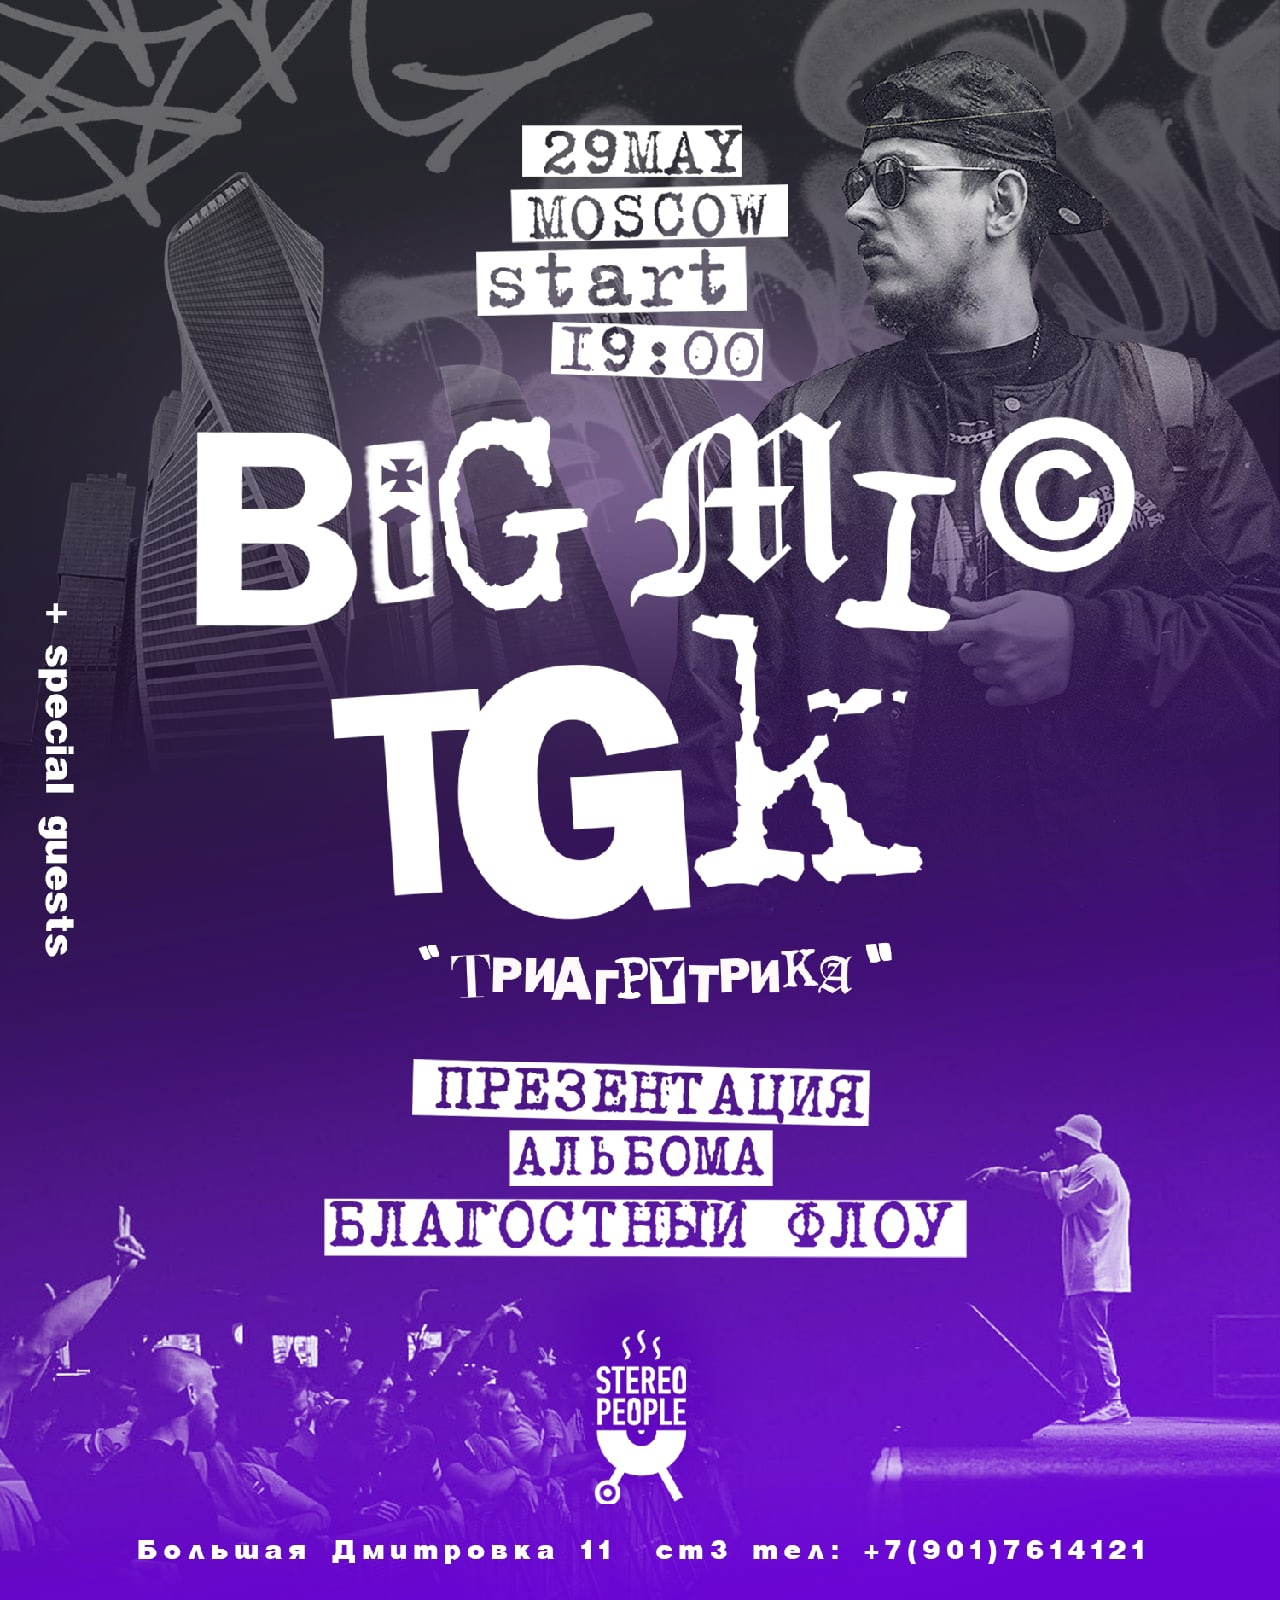 Big Mic TGK